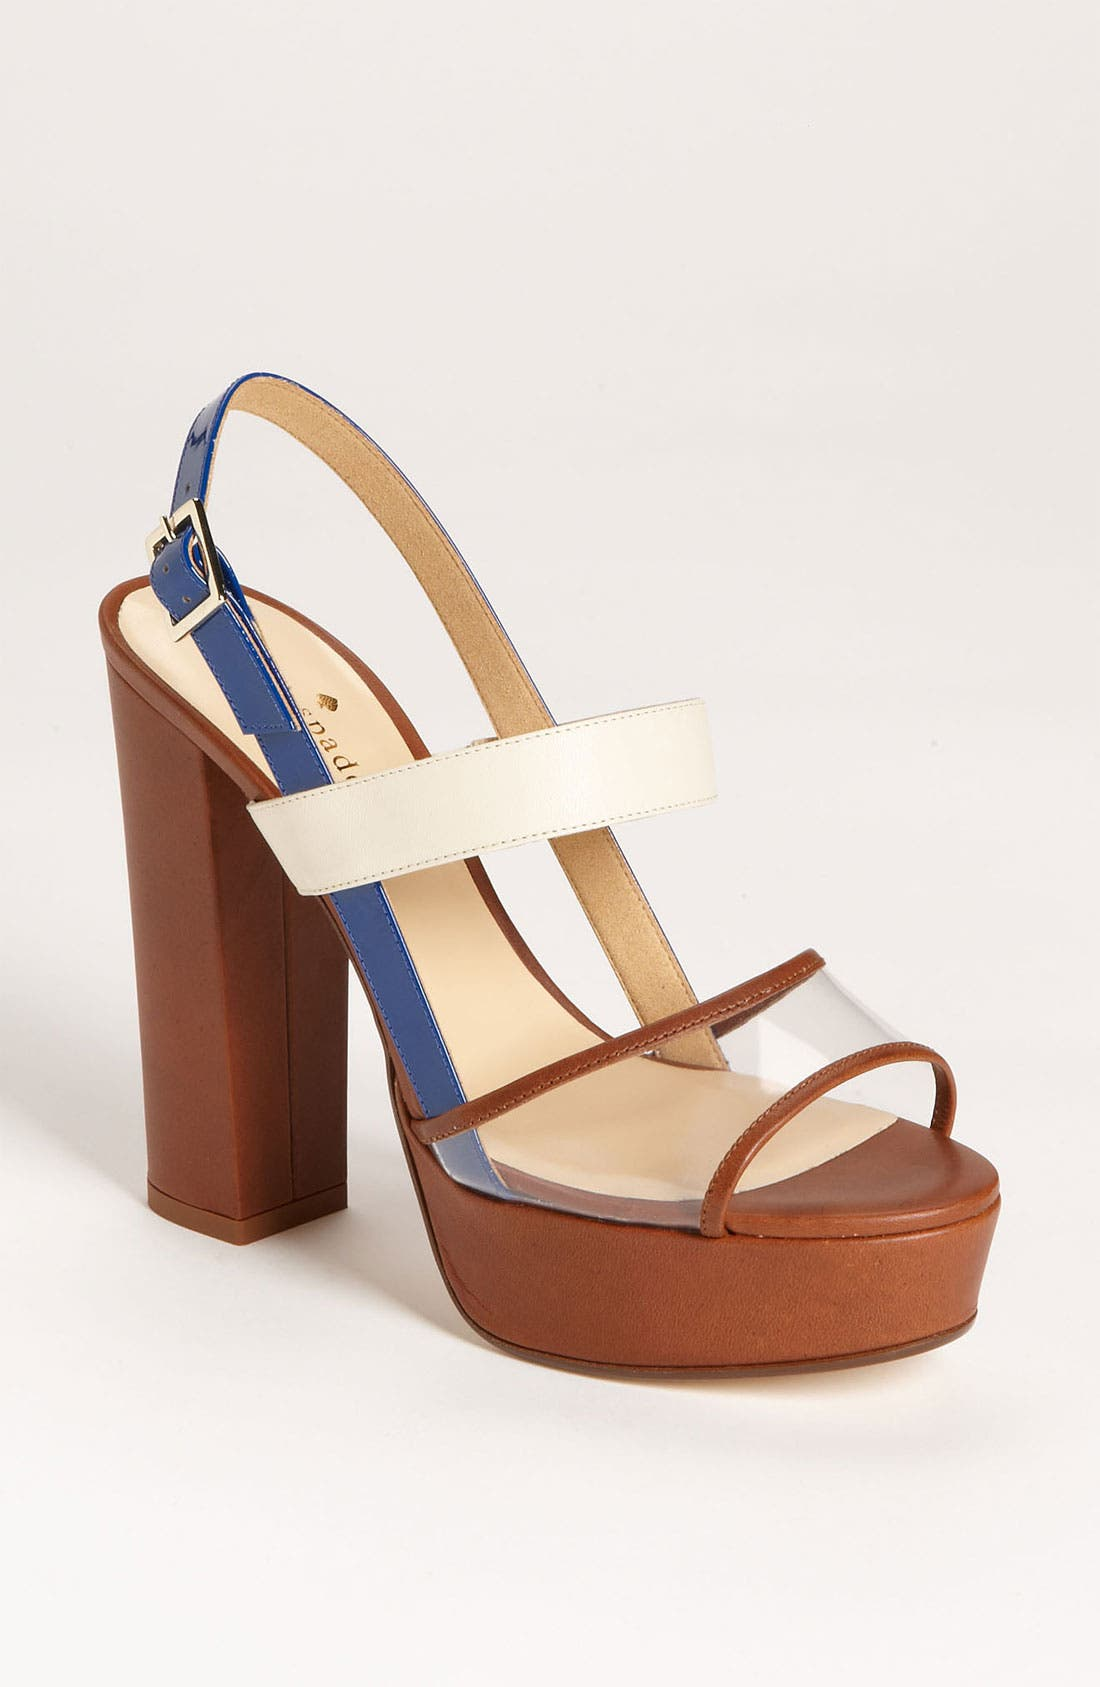 Main Image - kate spade new york 'izzy' sandal